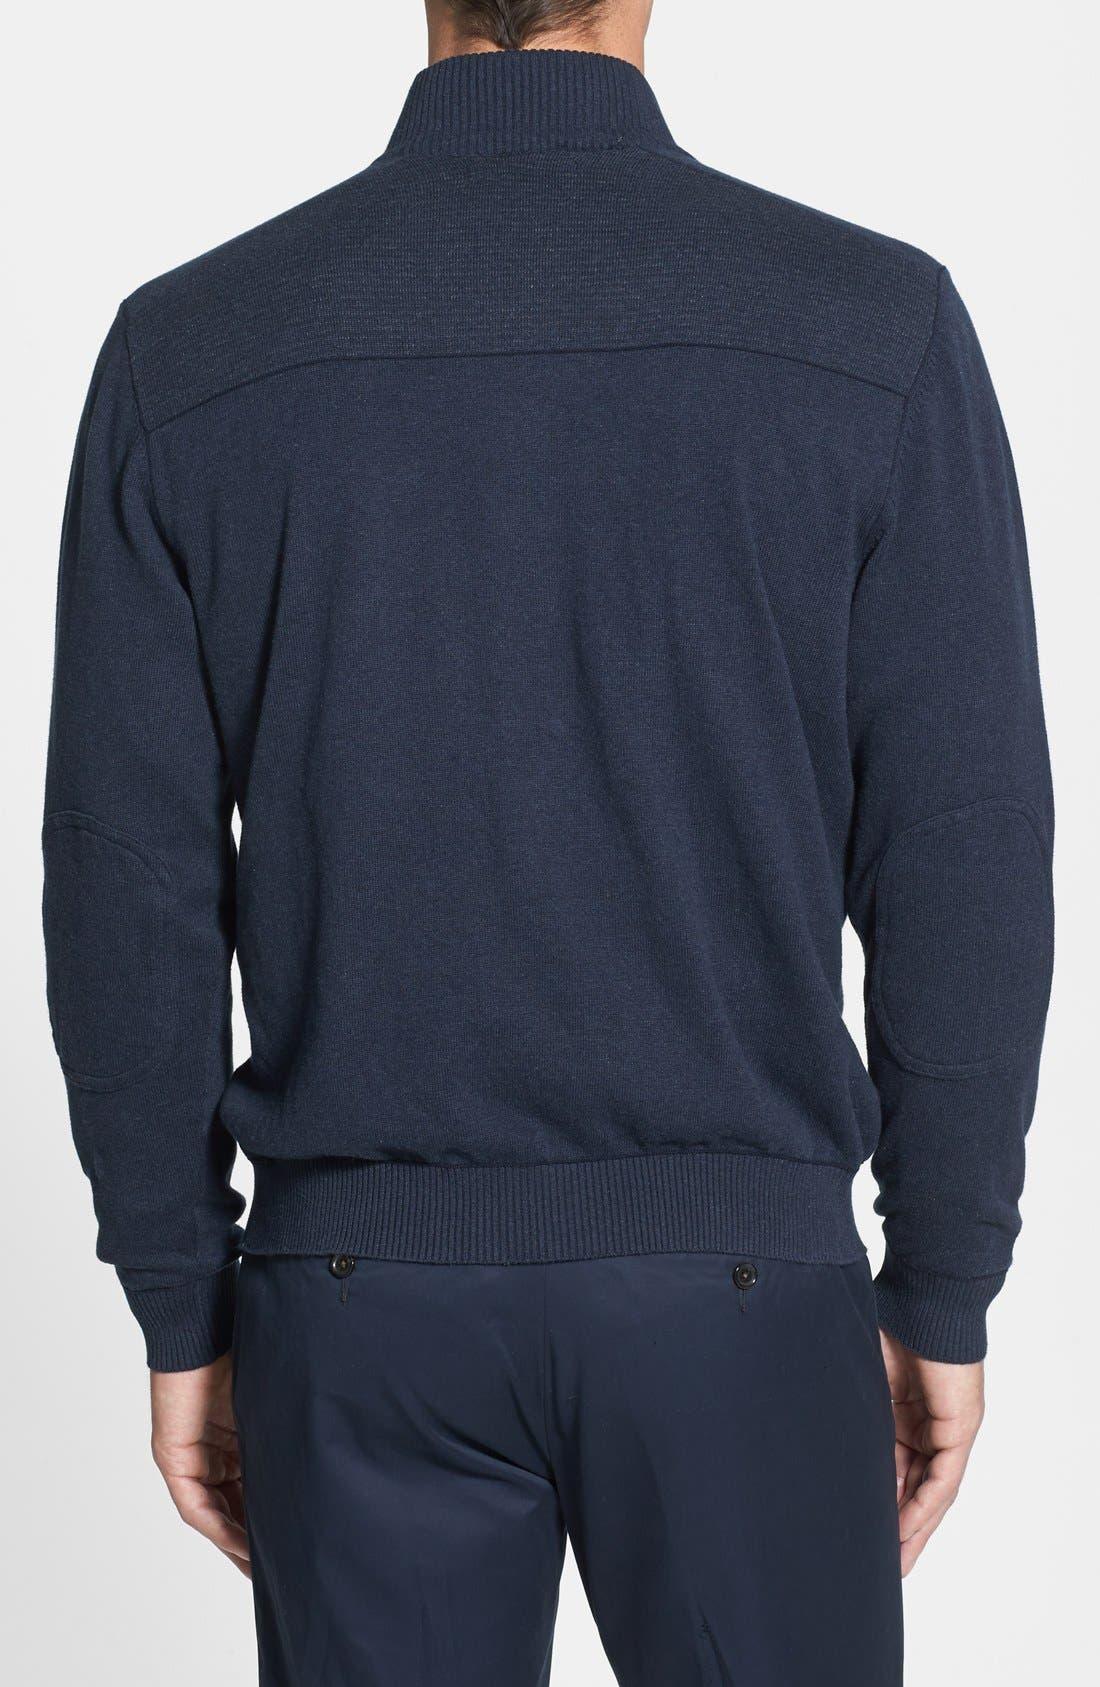 CUTTER & BUCK,                             Broadview Half Zip Sweater,                             Alternate thumbnail 2, color,                             480